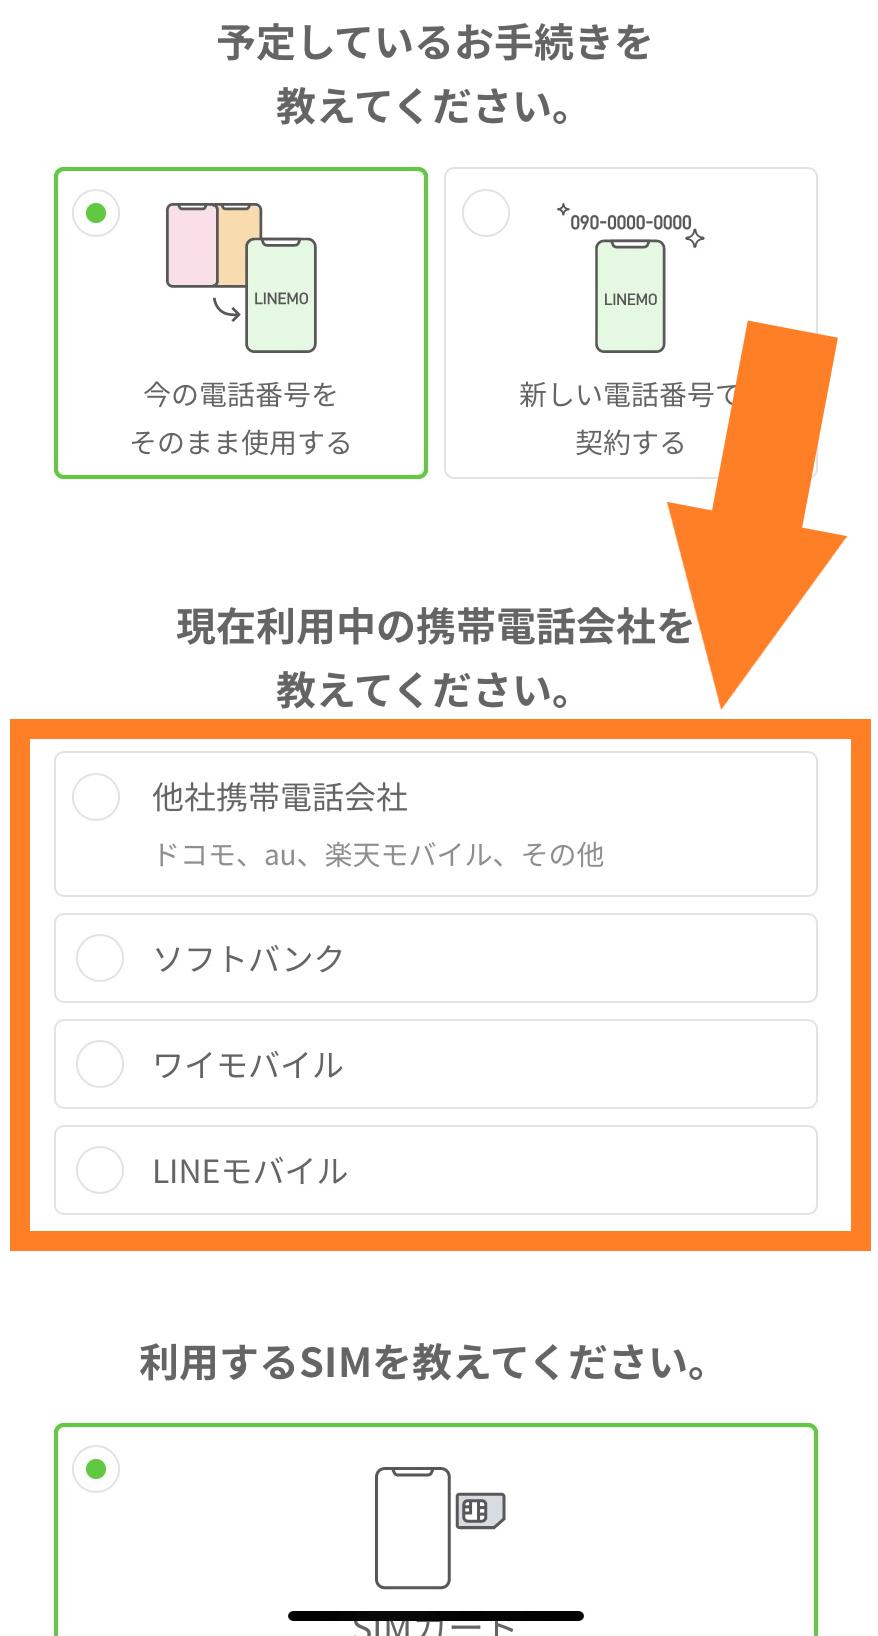 LINEMO_iPhone_LINEMO申し込み手続き3